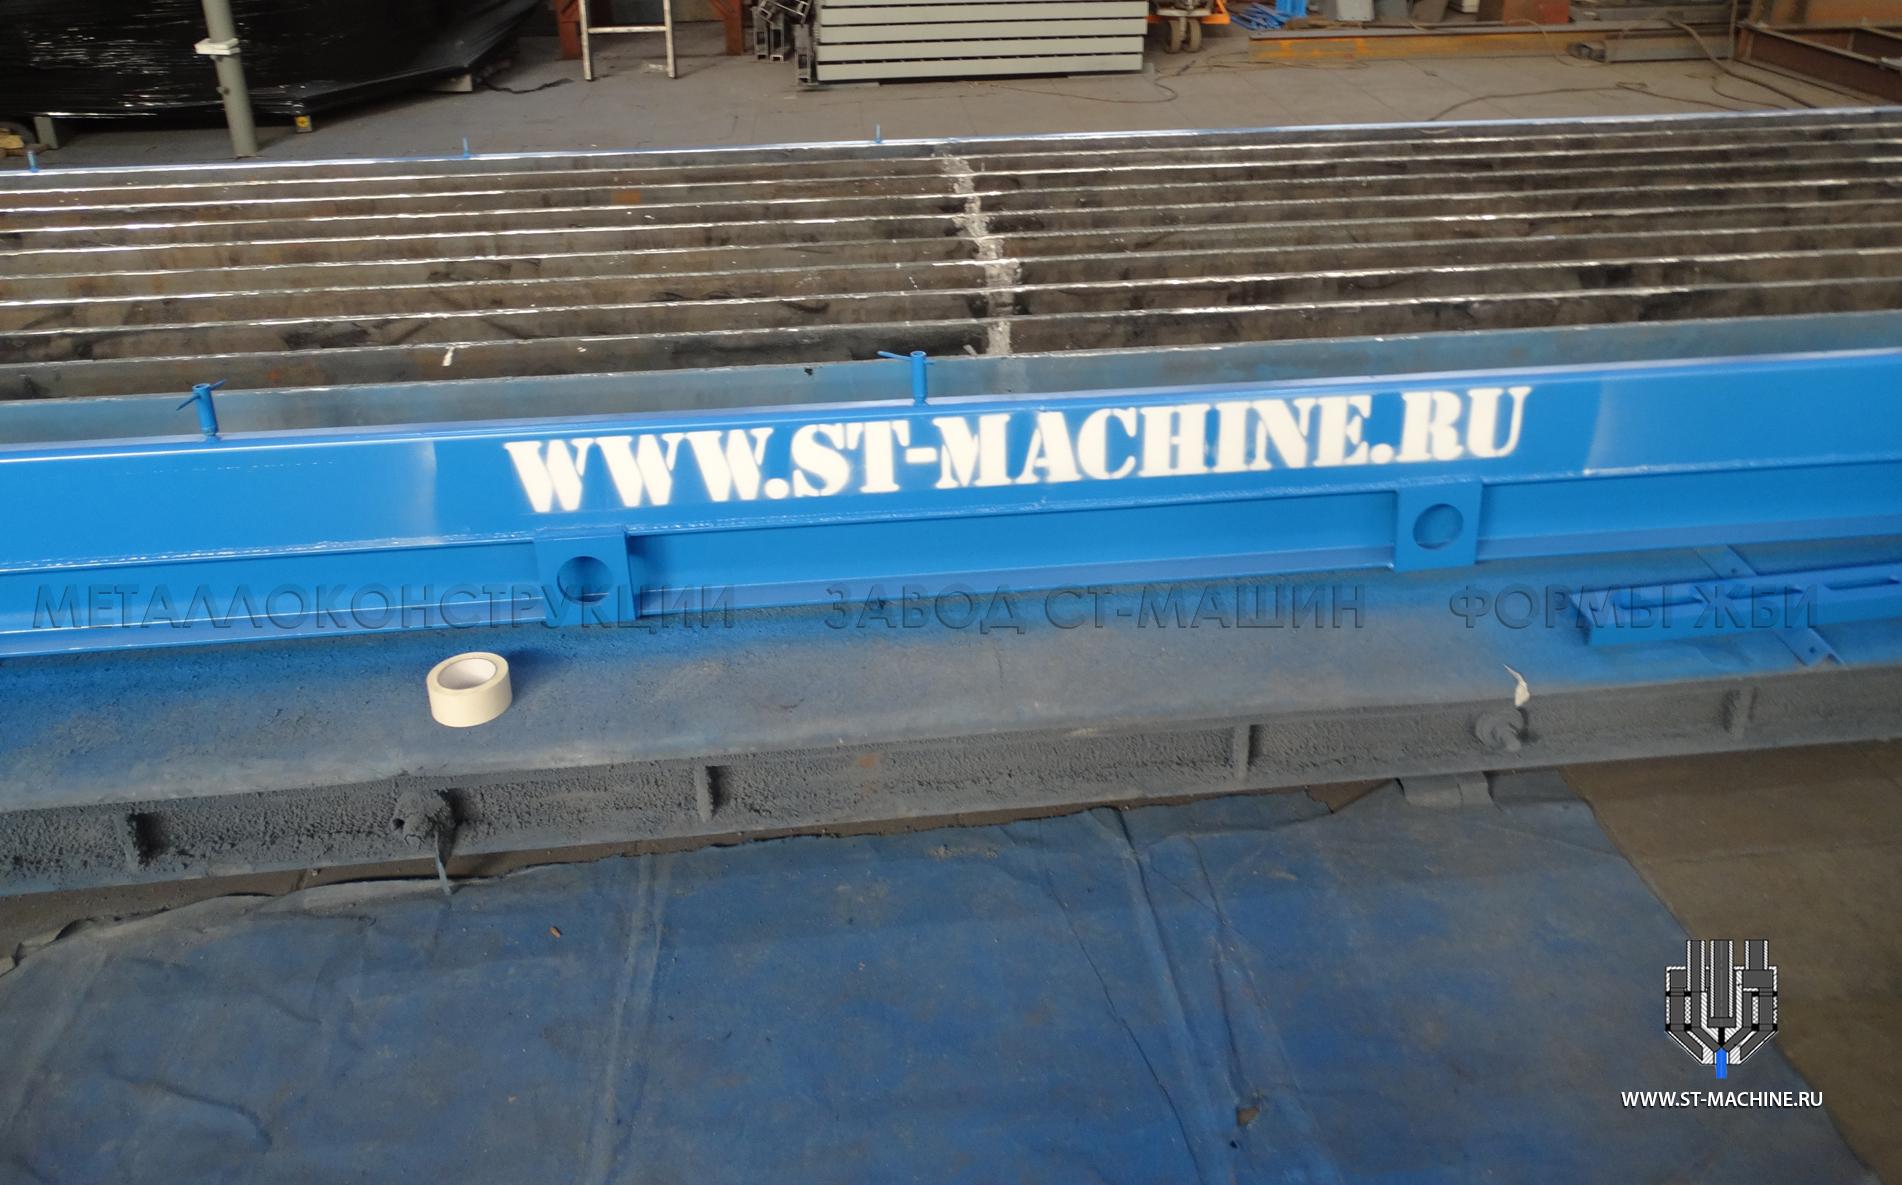 st-machine-formu-gbi-svai-ст-машин-форма-жби-сваи-ст.jpg